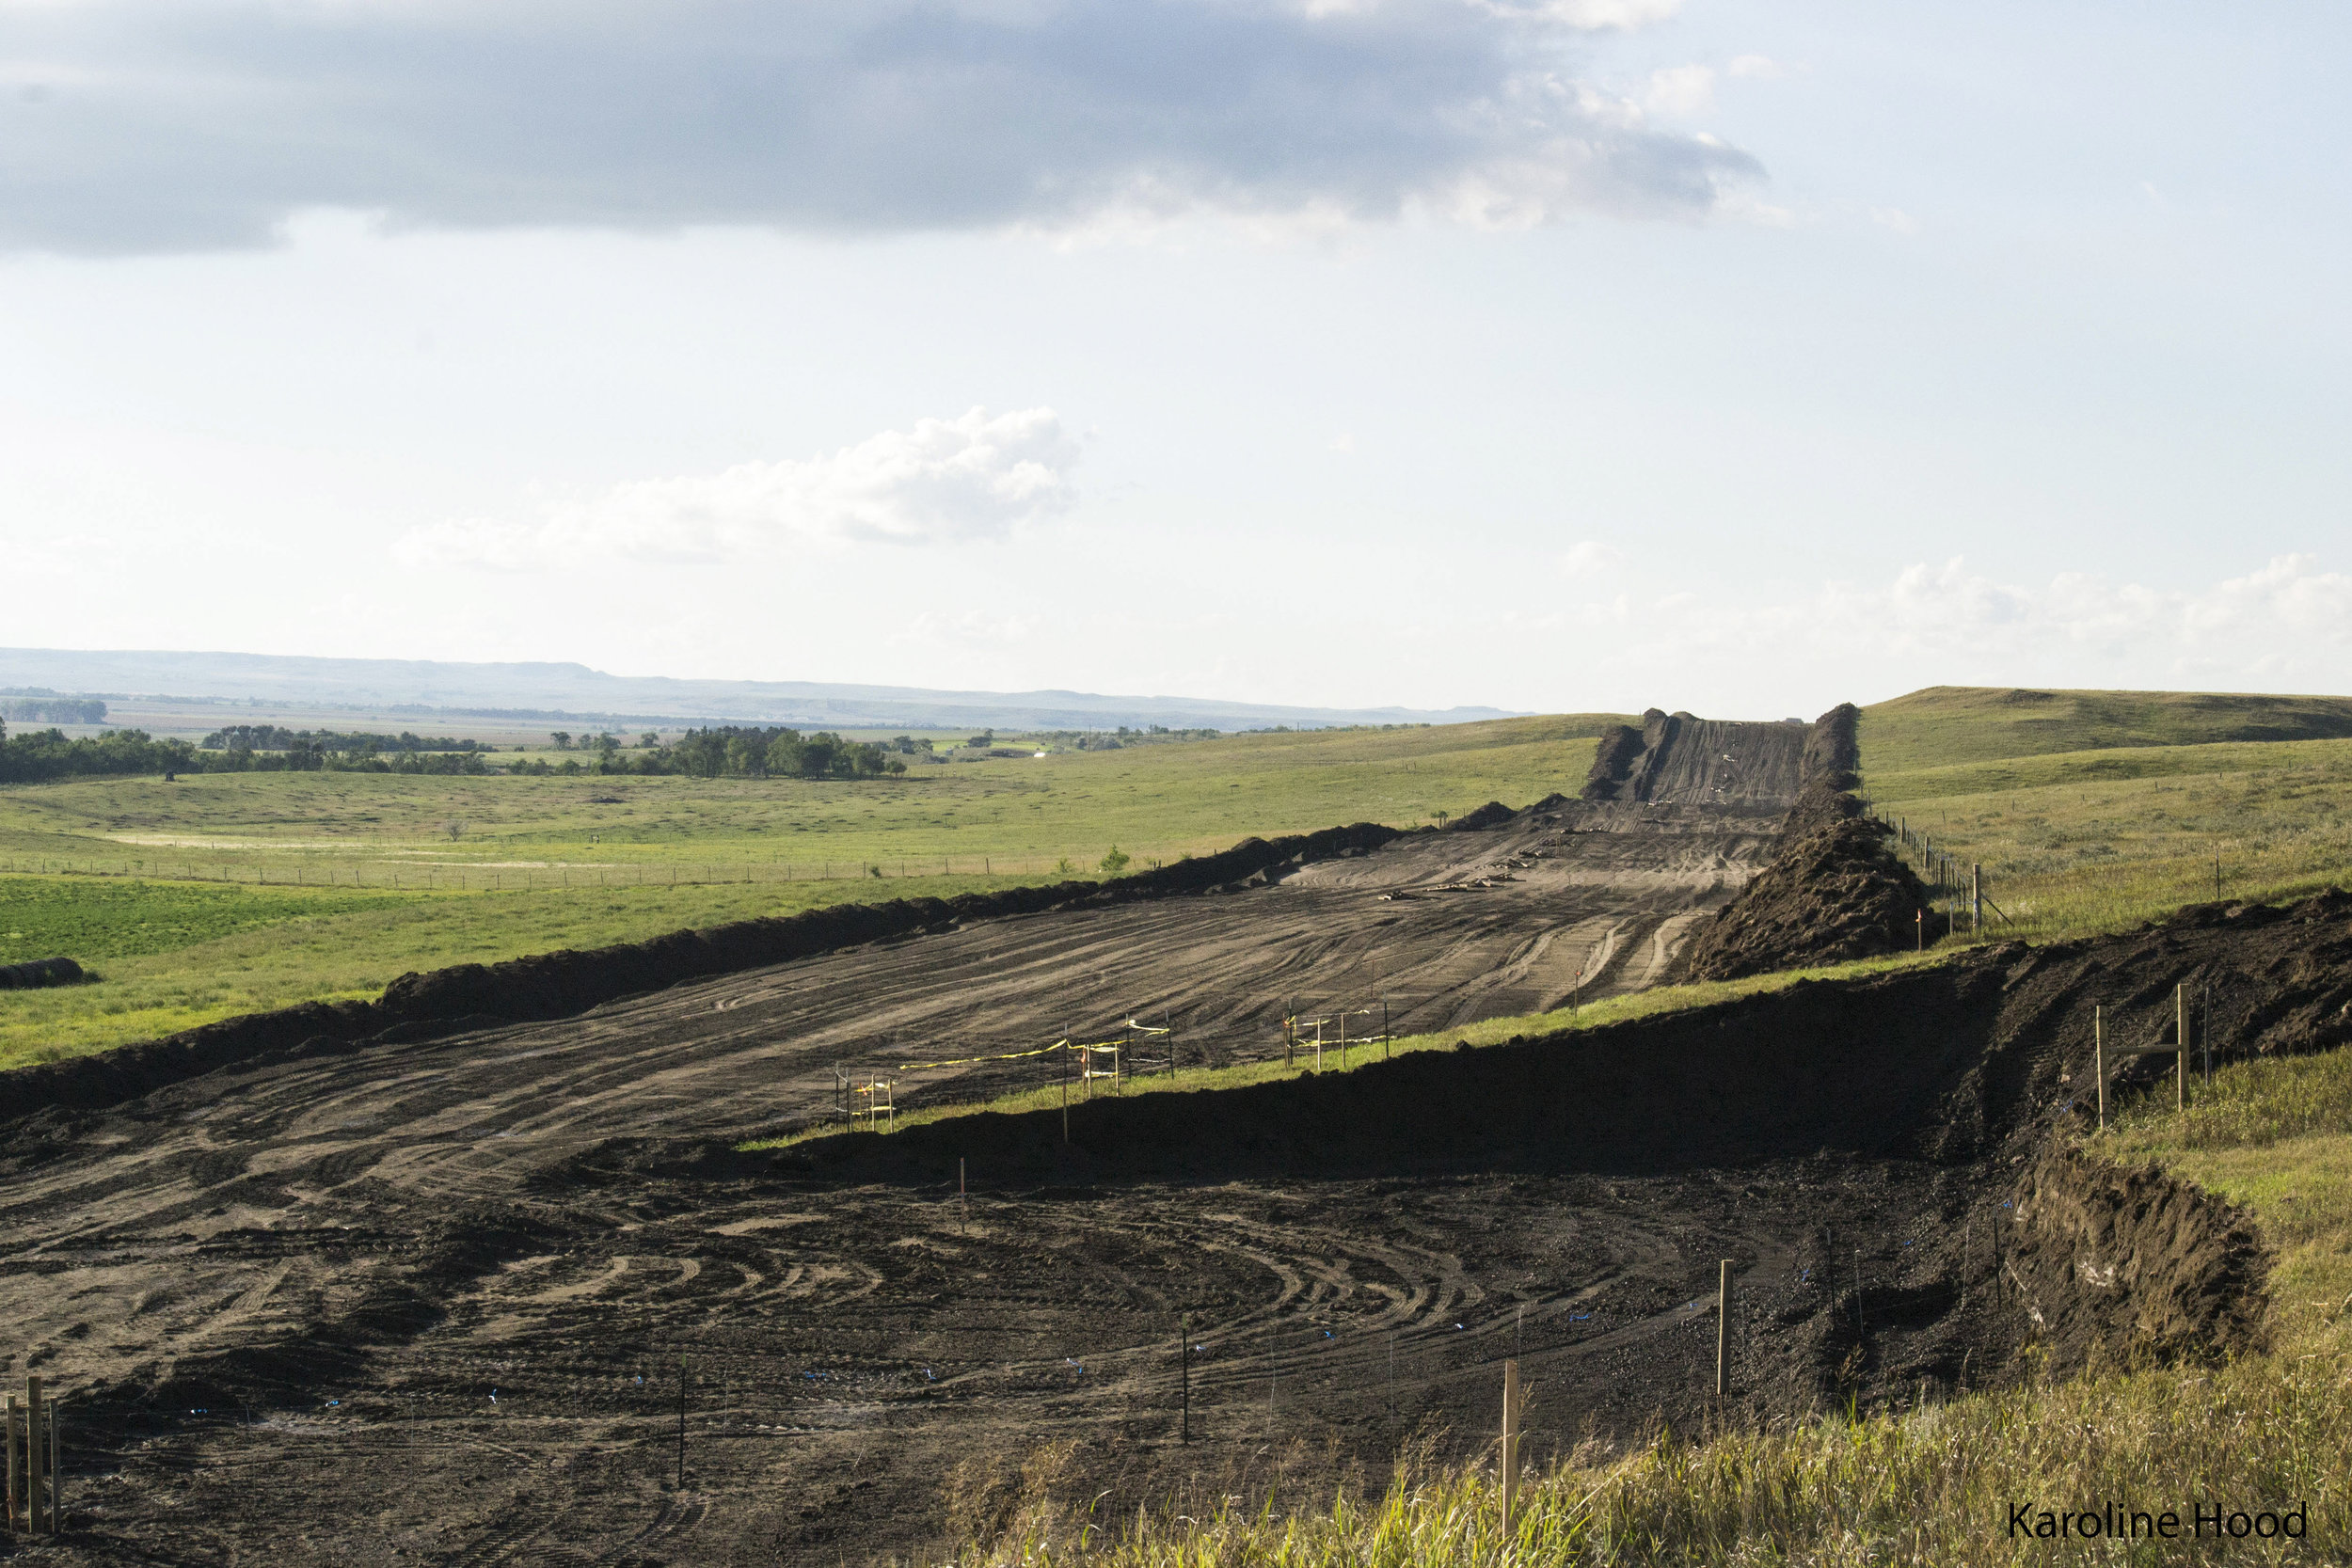 Pipeline work.